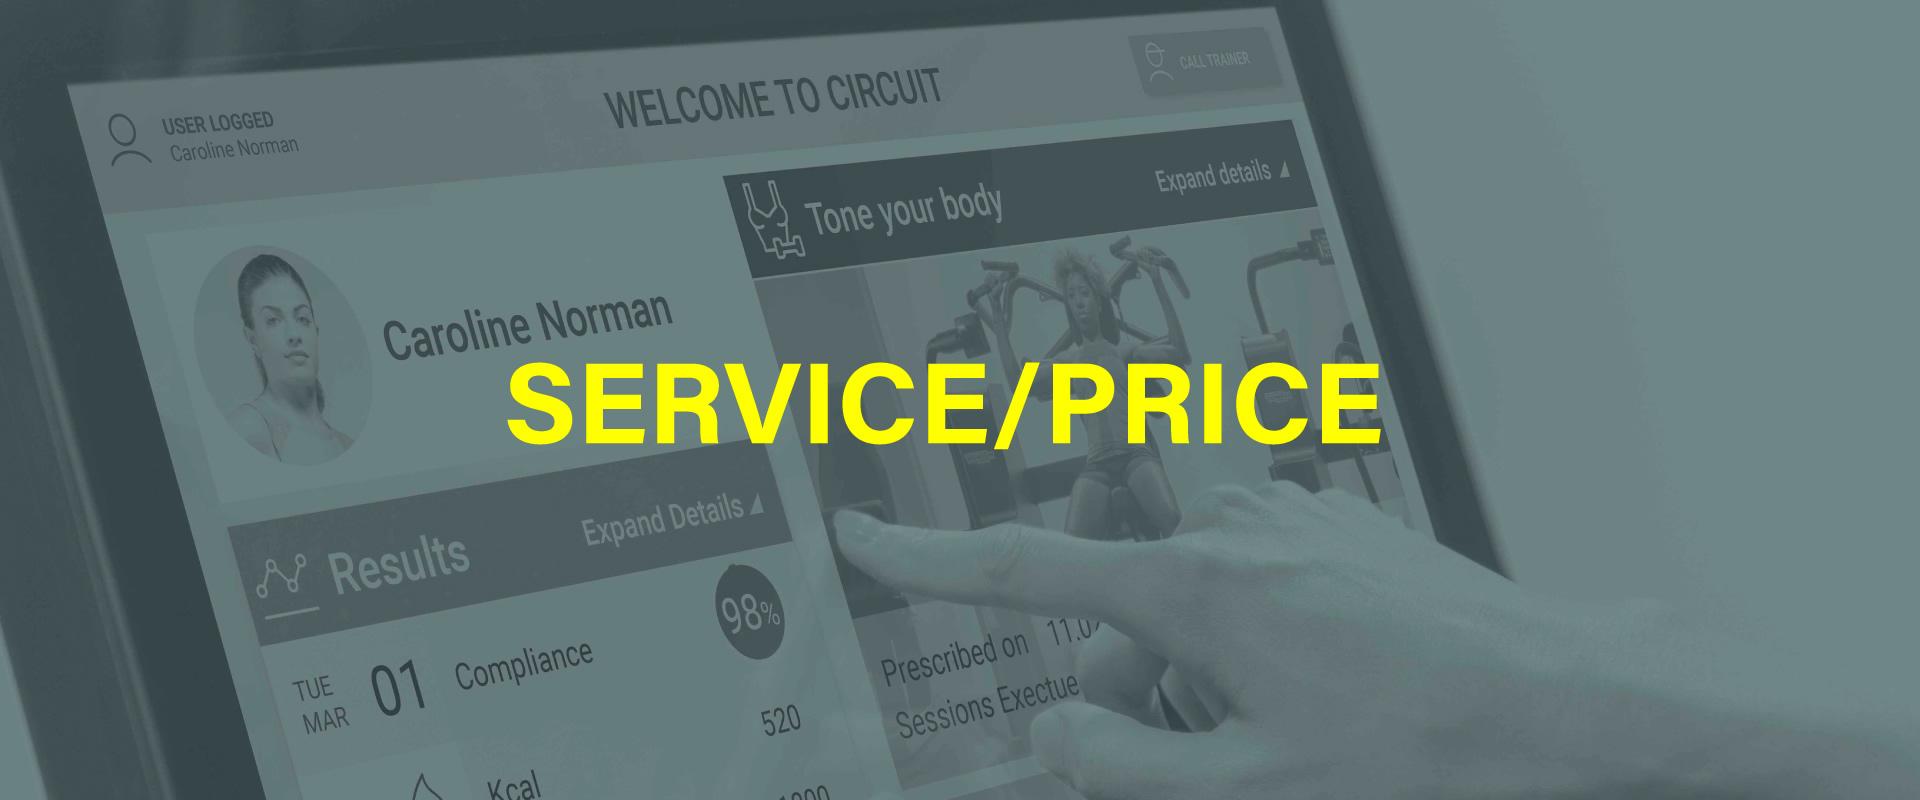 SERVICE/PRICE